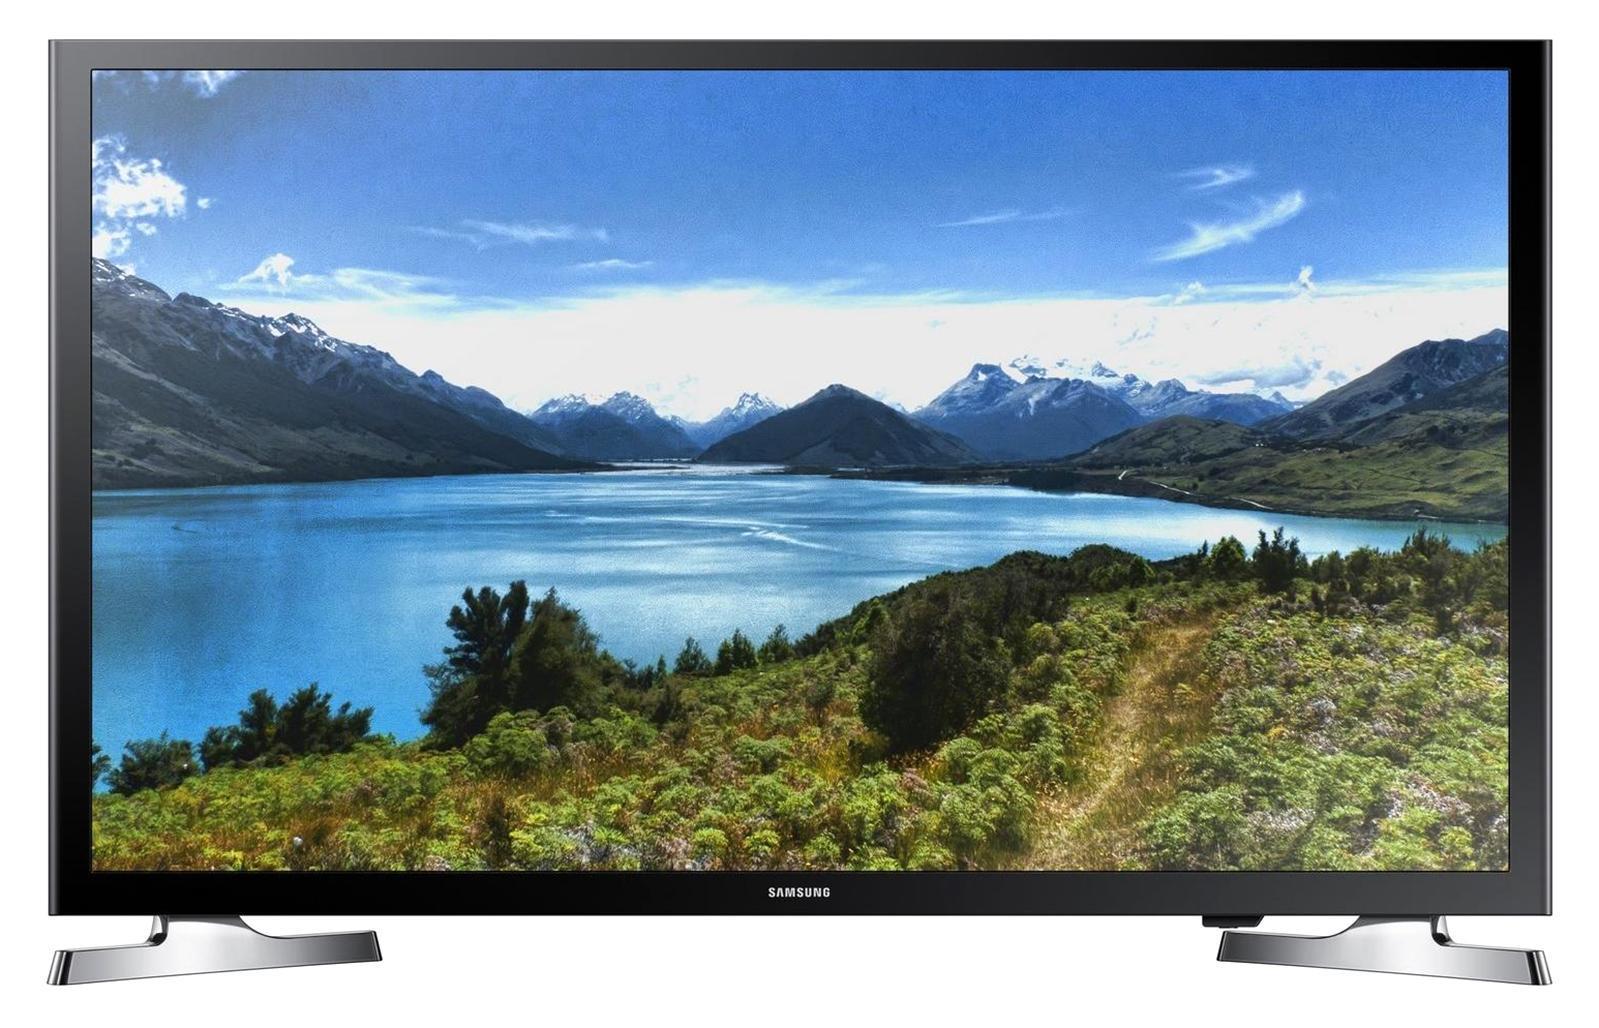 Samsung UE-32J4500AKX телевизор купить в москве телевизор самсунг ue 40d5000rw